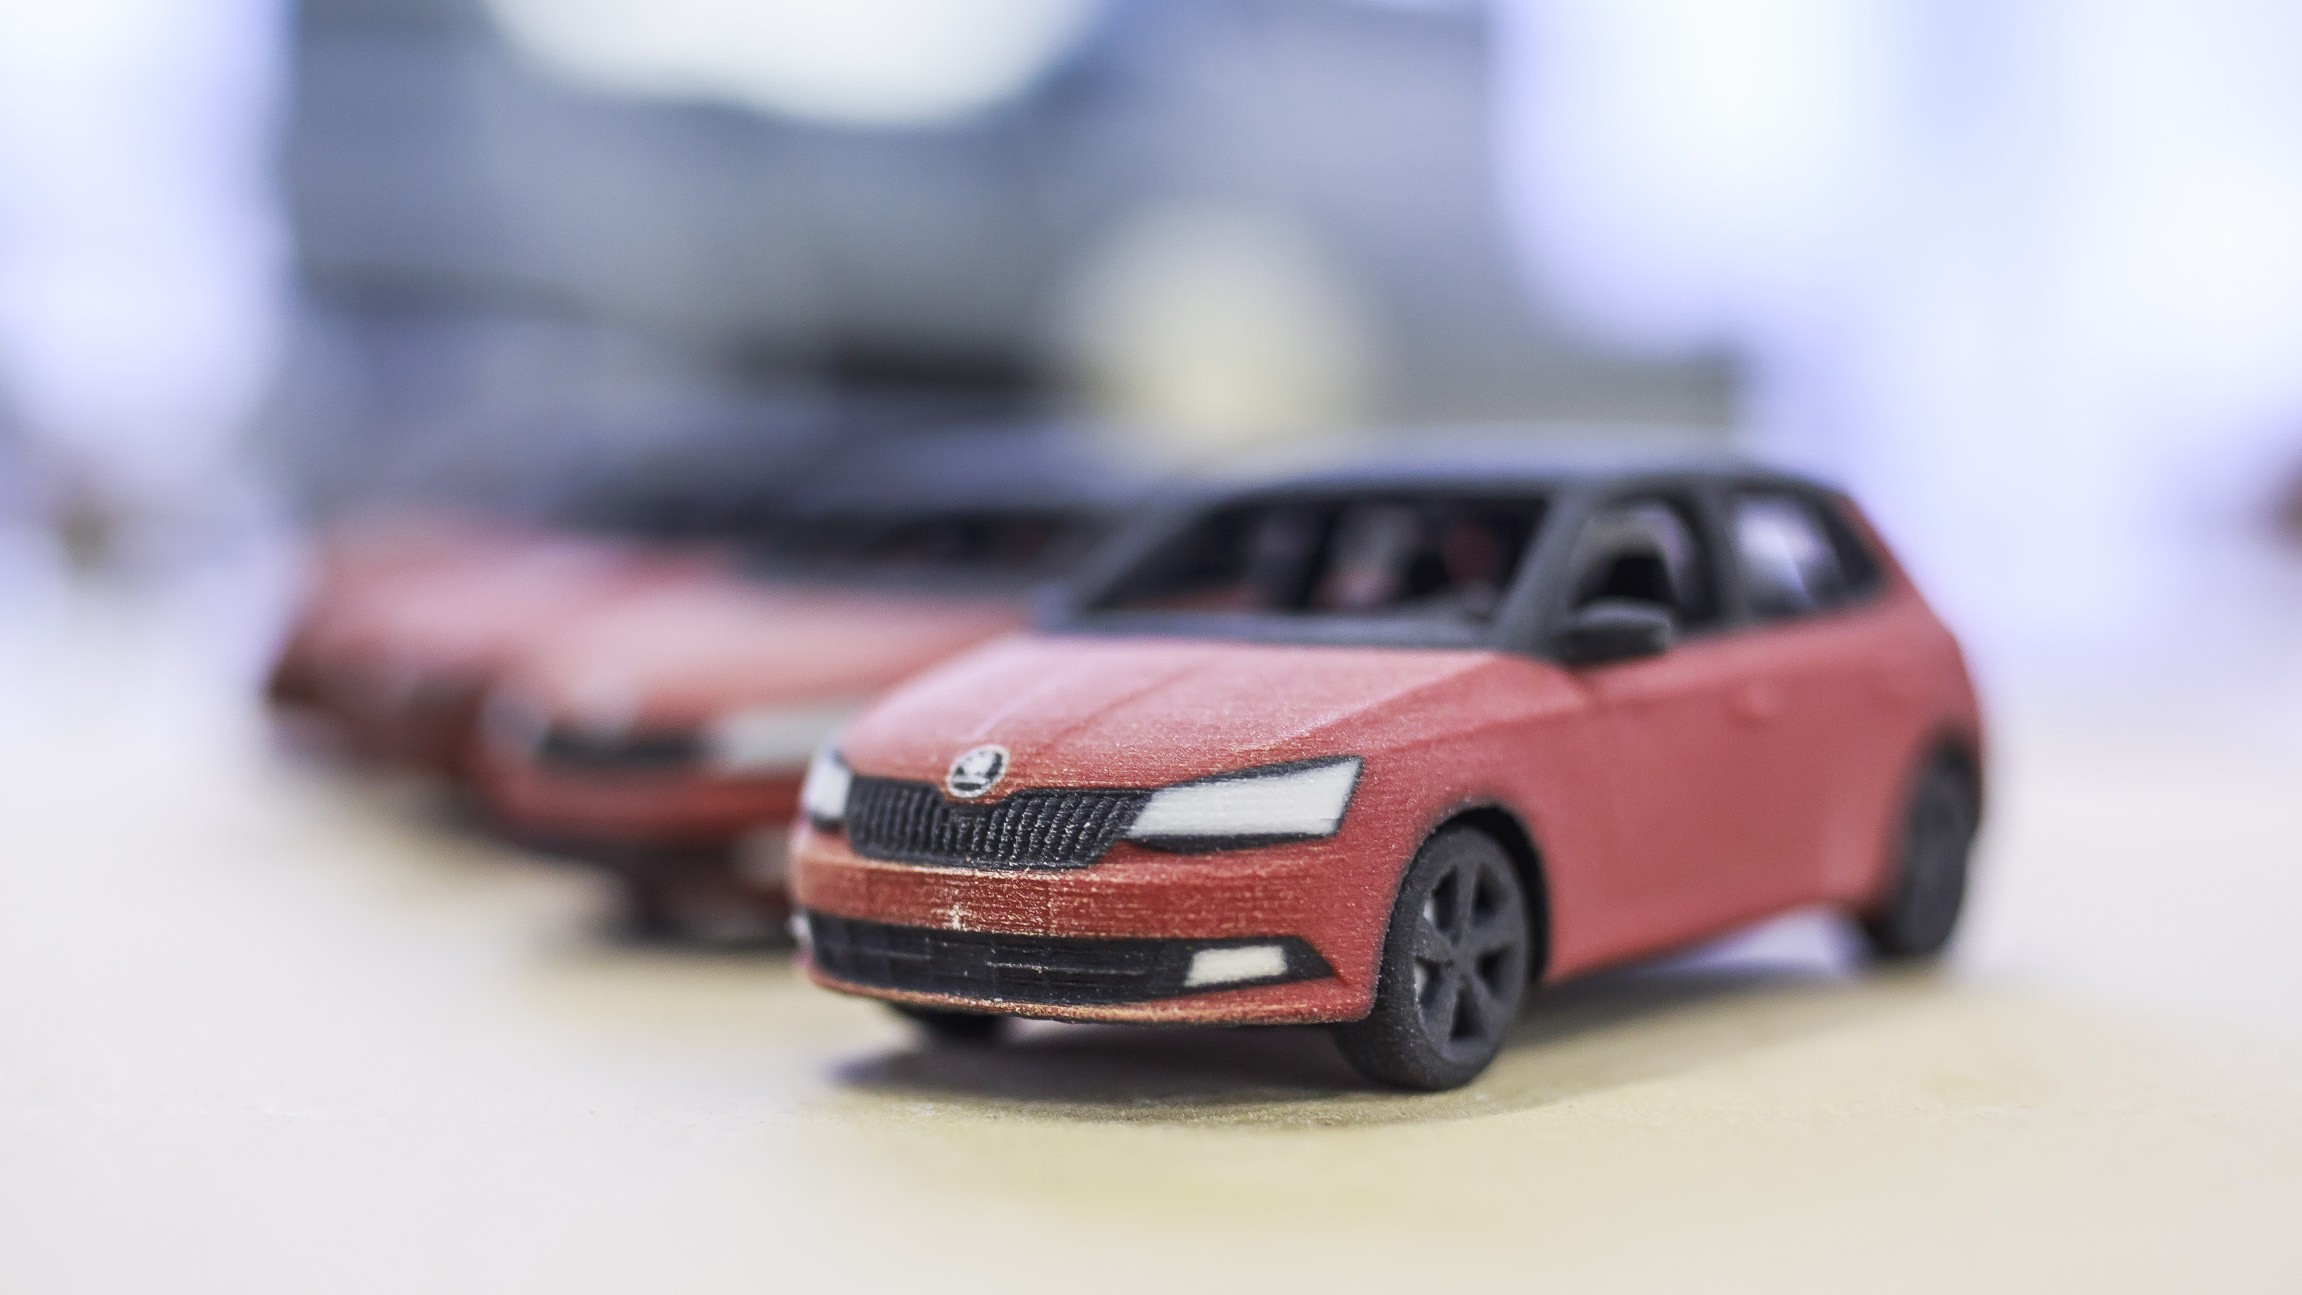 SKÔDA France 3D prints little Fabias! - Sculpteo Blog